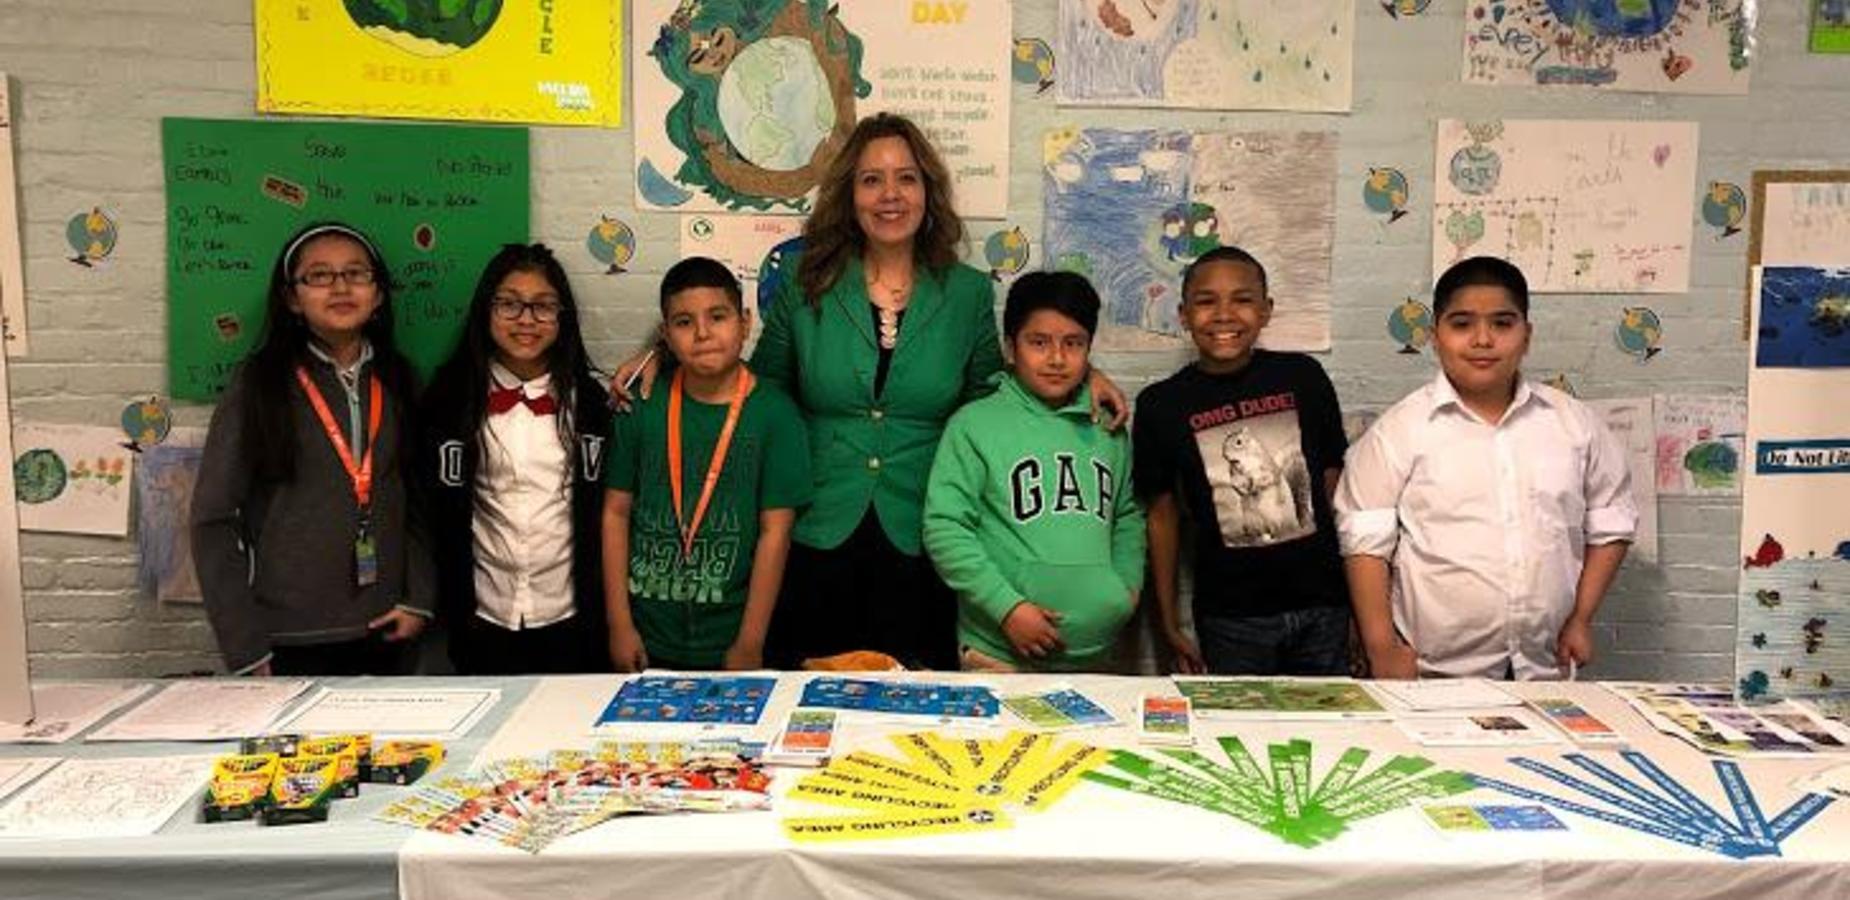 Principal Garzon & Green Team member at Earth Day Celebration.